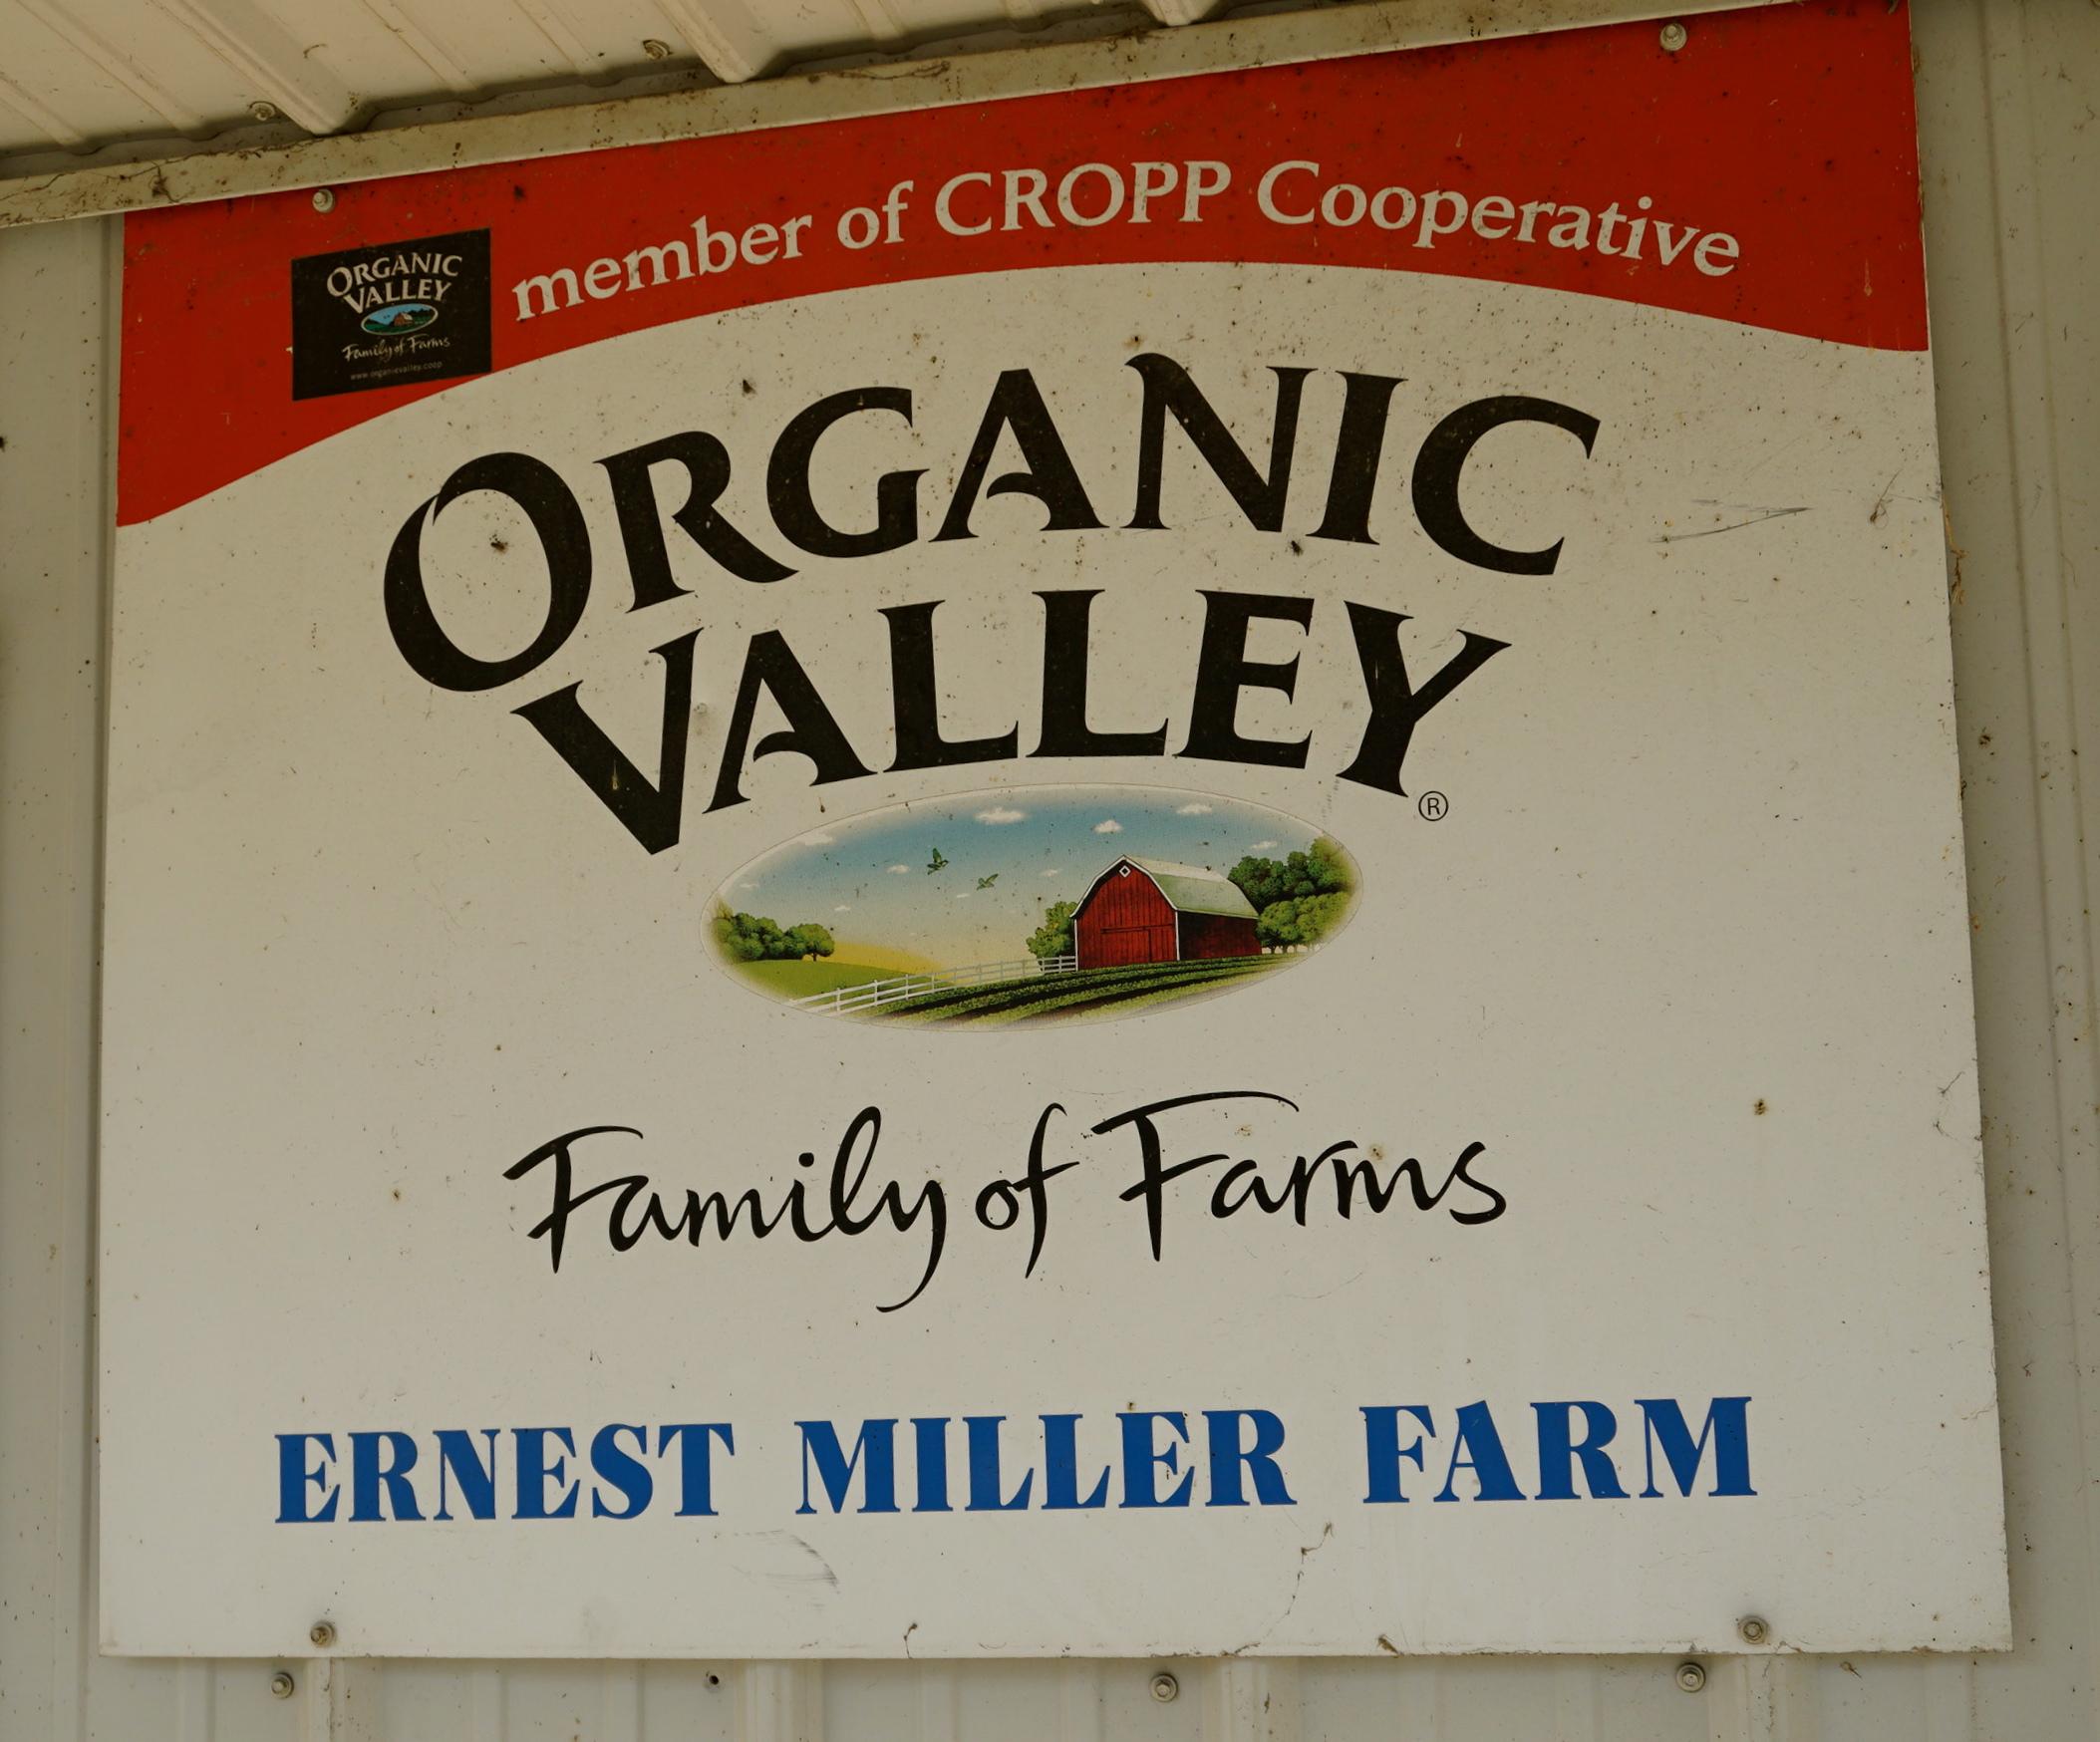 Ernest Miller Farm Organic Valley sign